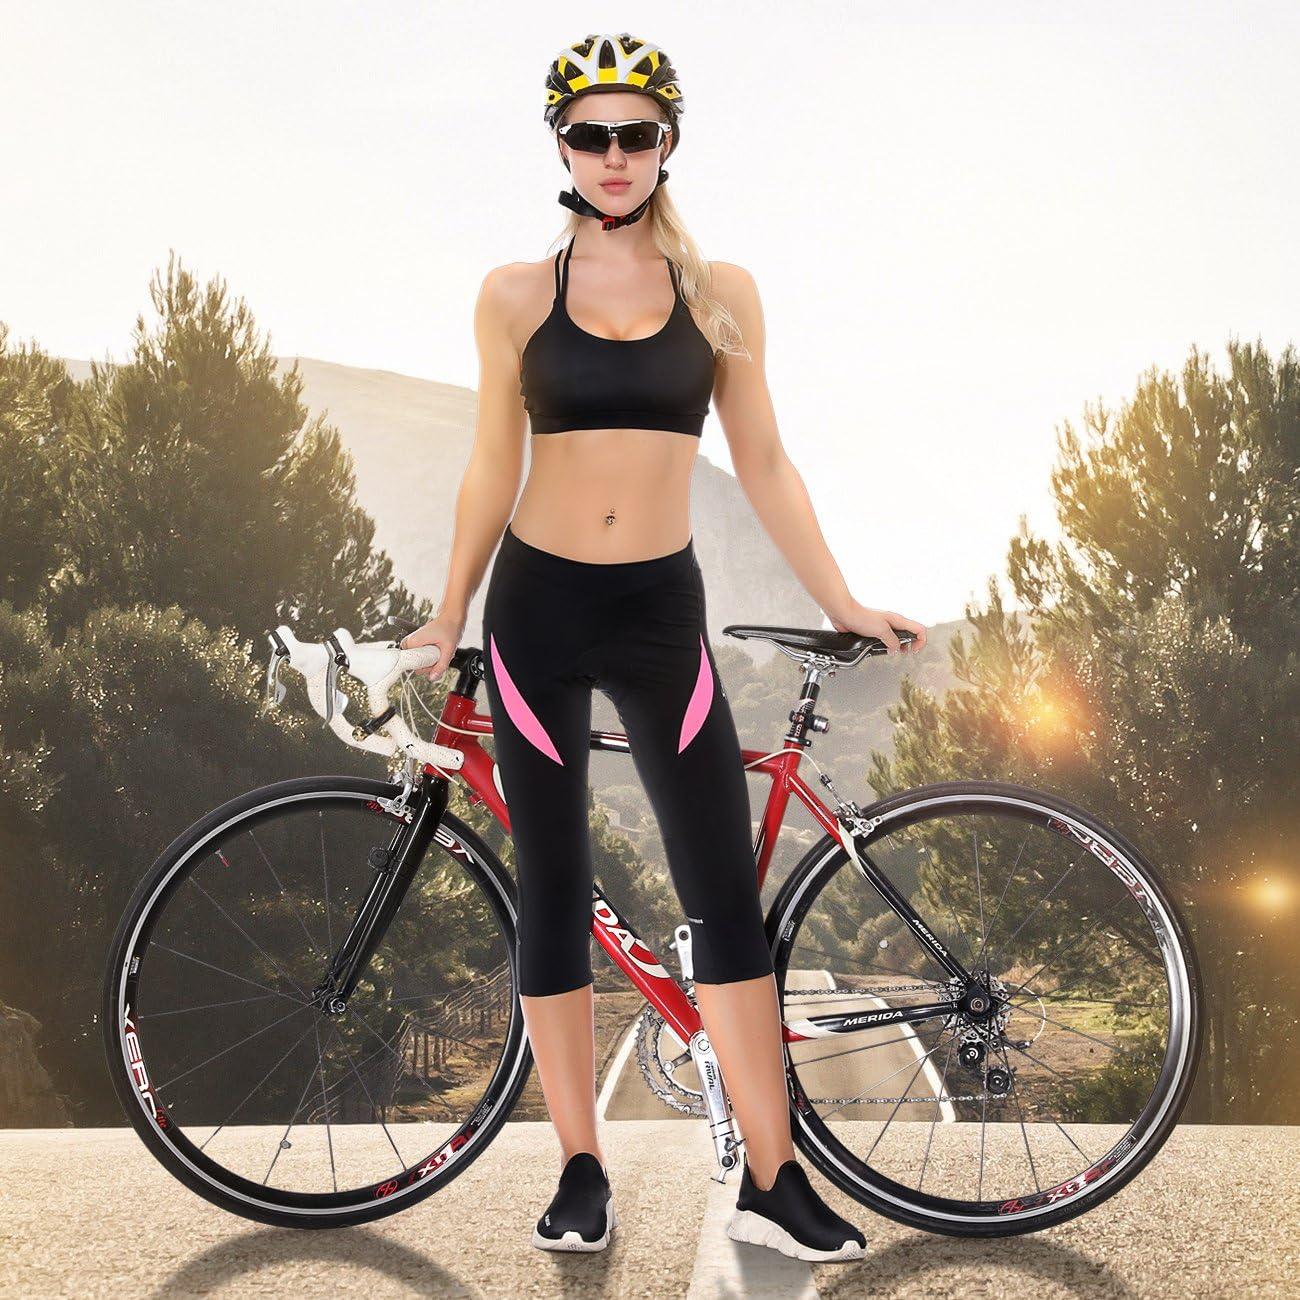 Ao dai Santic Pantaloni Ciclismo Donna Imbottiti Pantaloni Ciclista Donna Pantaloni Bicicletta Imbottiti 3//4 per Donna